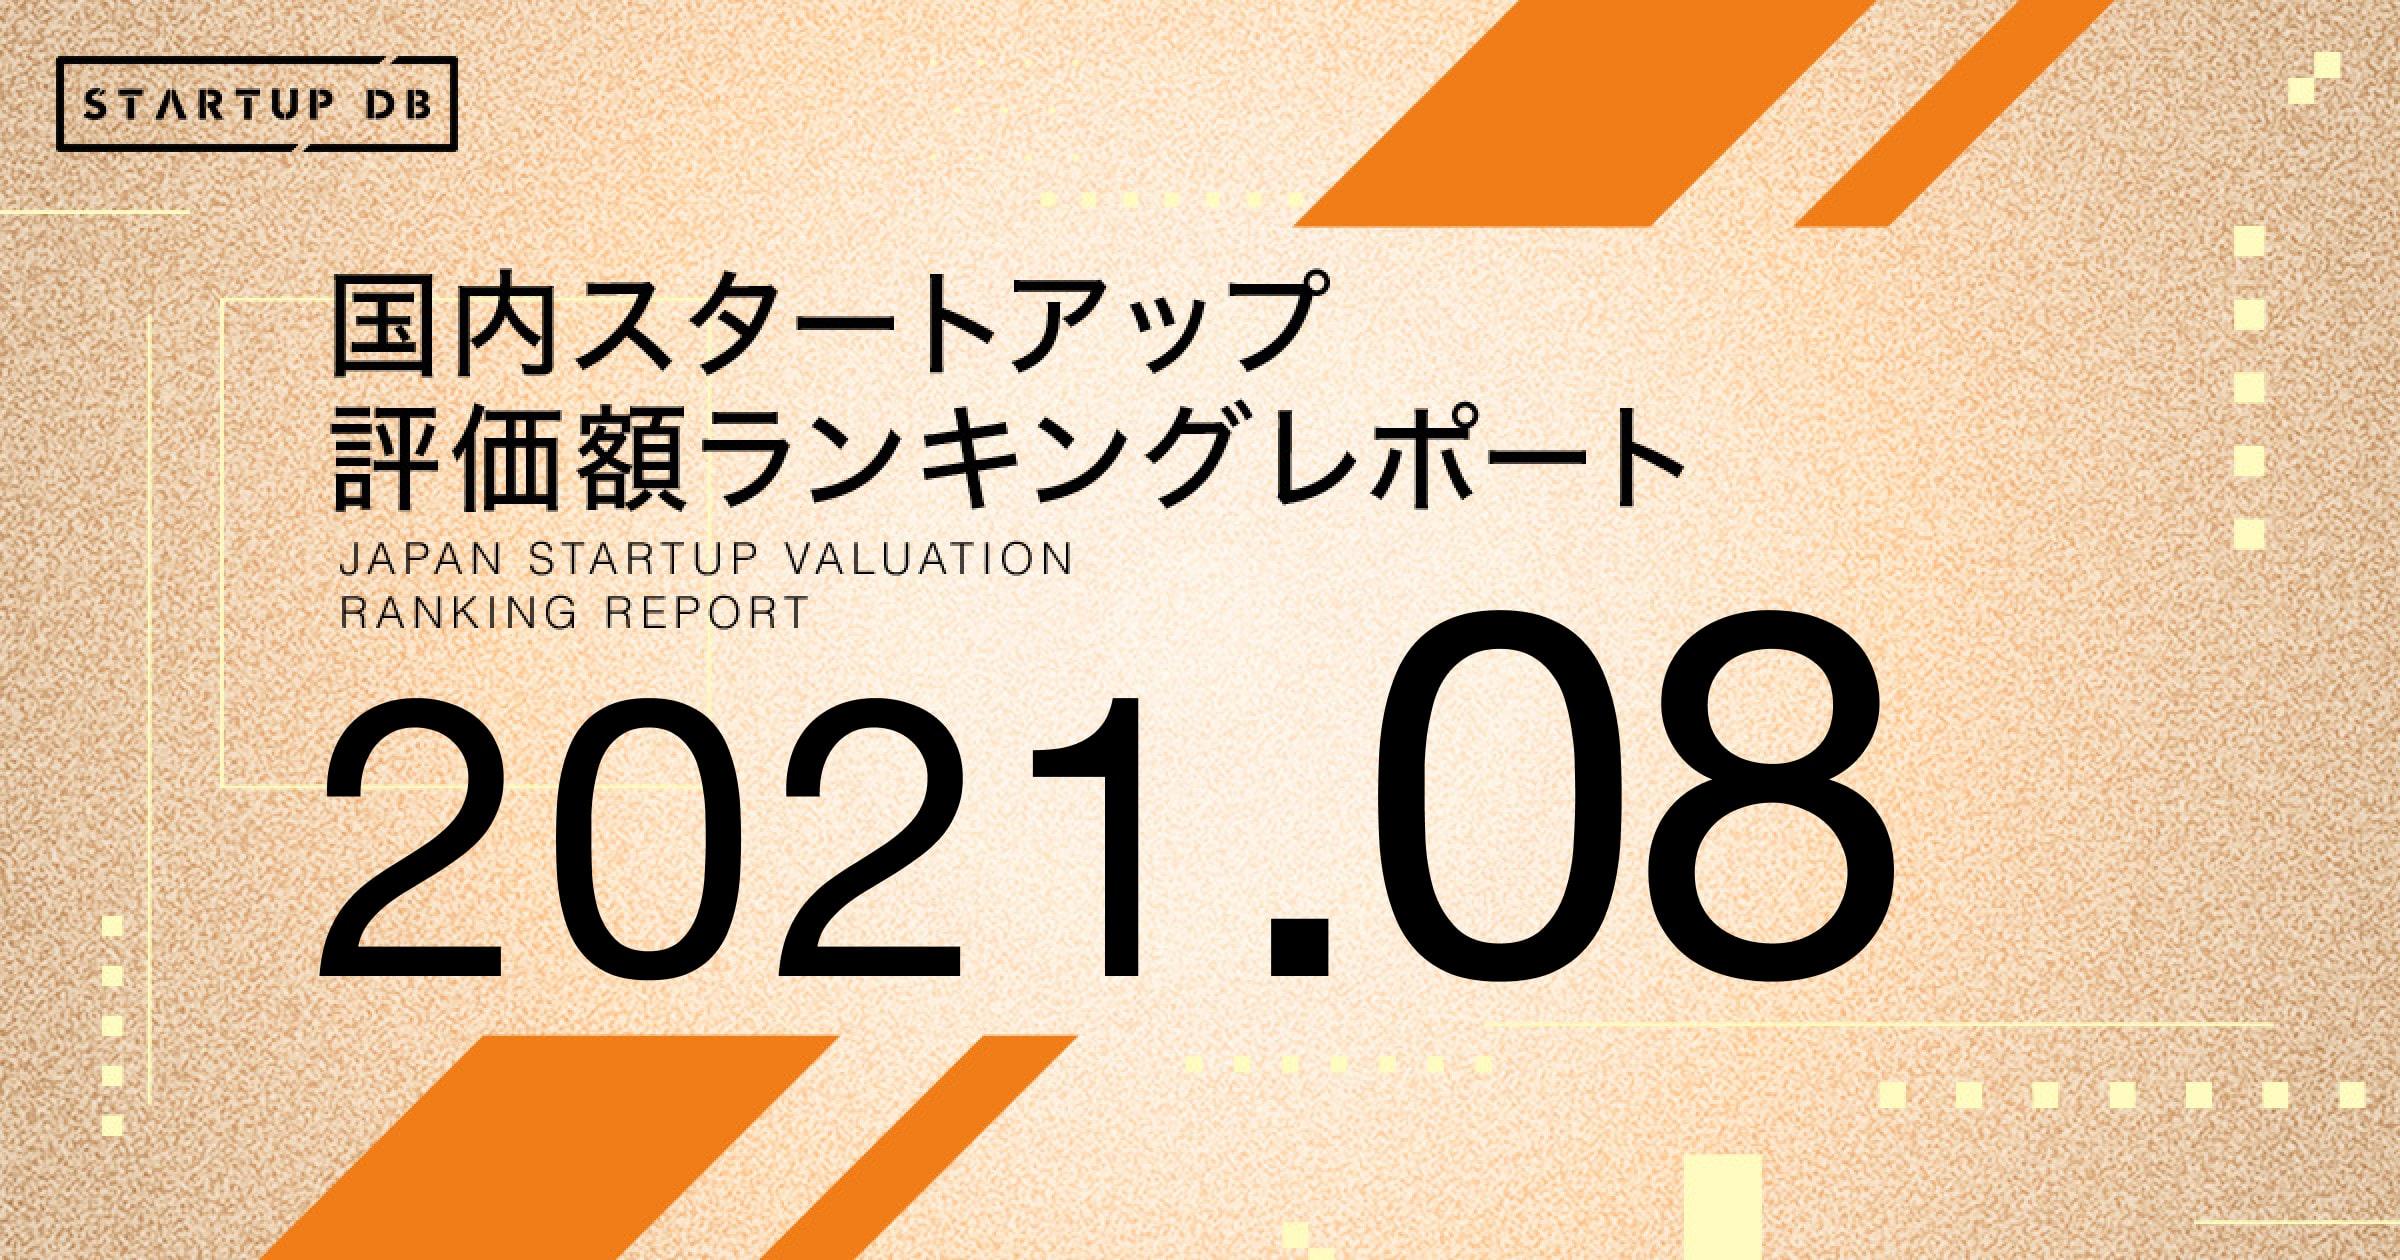 【STARTUP DB】調査結果 国内スタートアップ評価額ランキング(2021年8月)